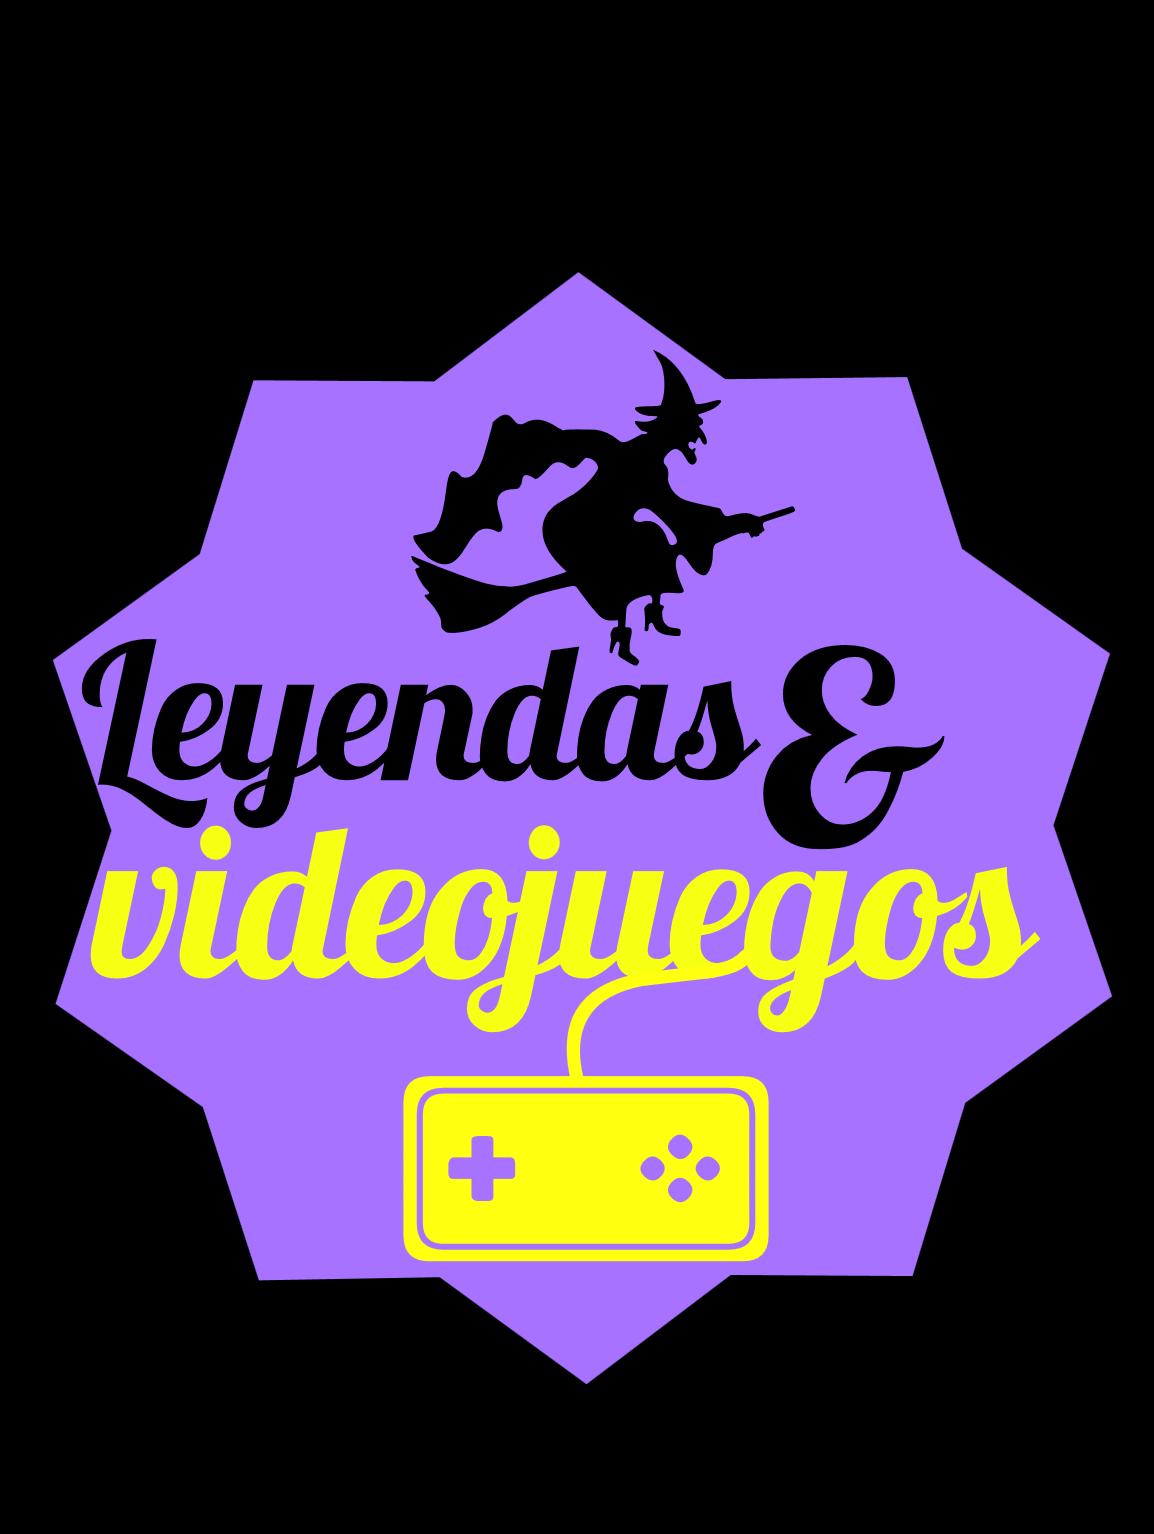 Leyendas & Videojuegos